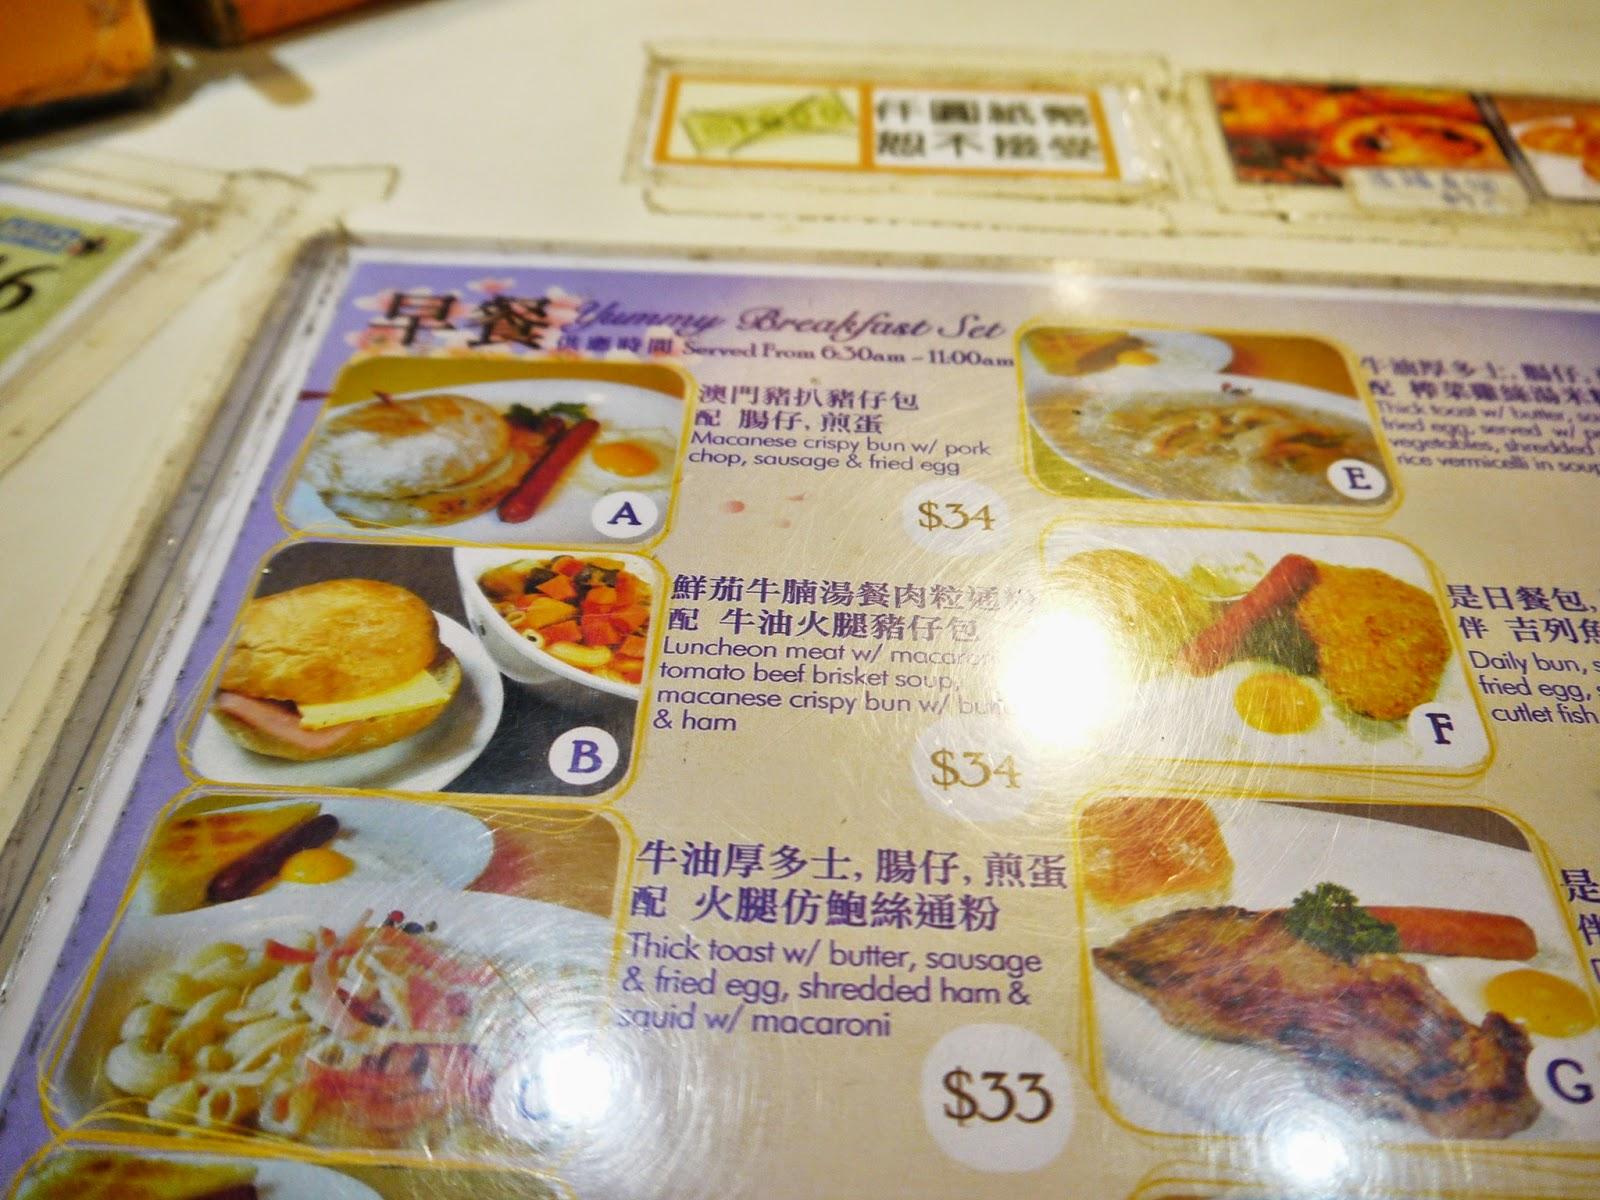 I'm Yu-i ♥: 港澳自由行 Day 3-1 ♥ 澳門茶餐廳→澳門漁人碼頭